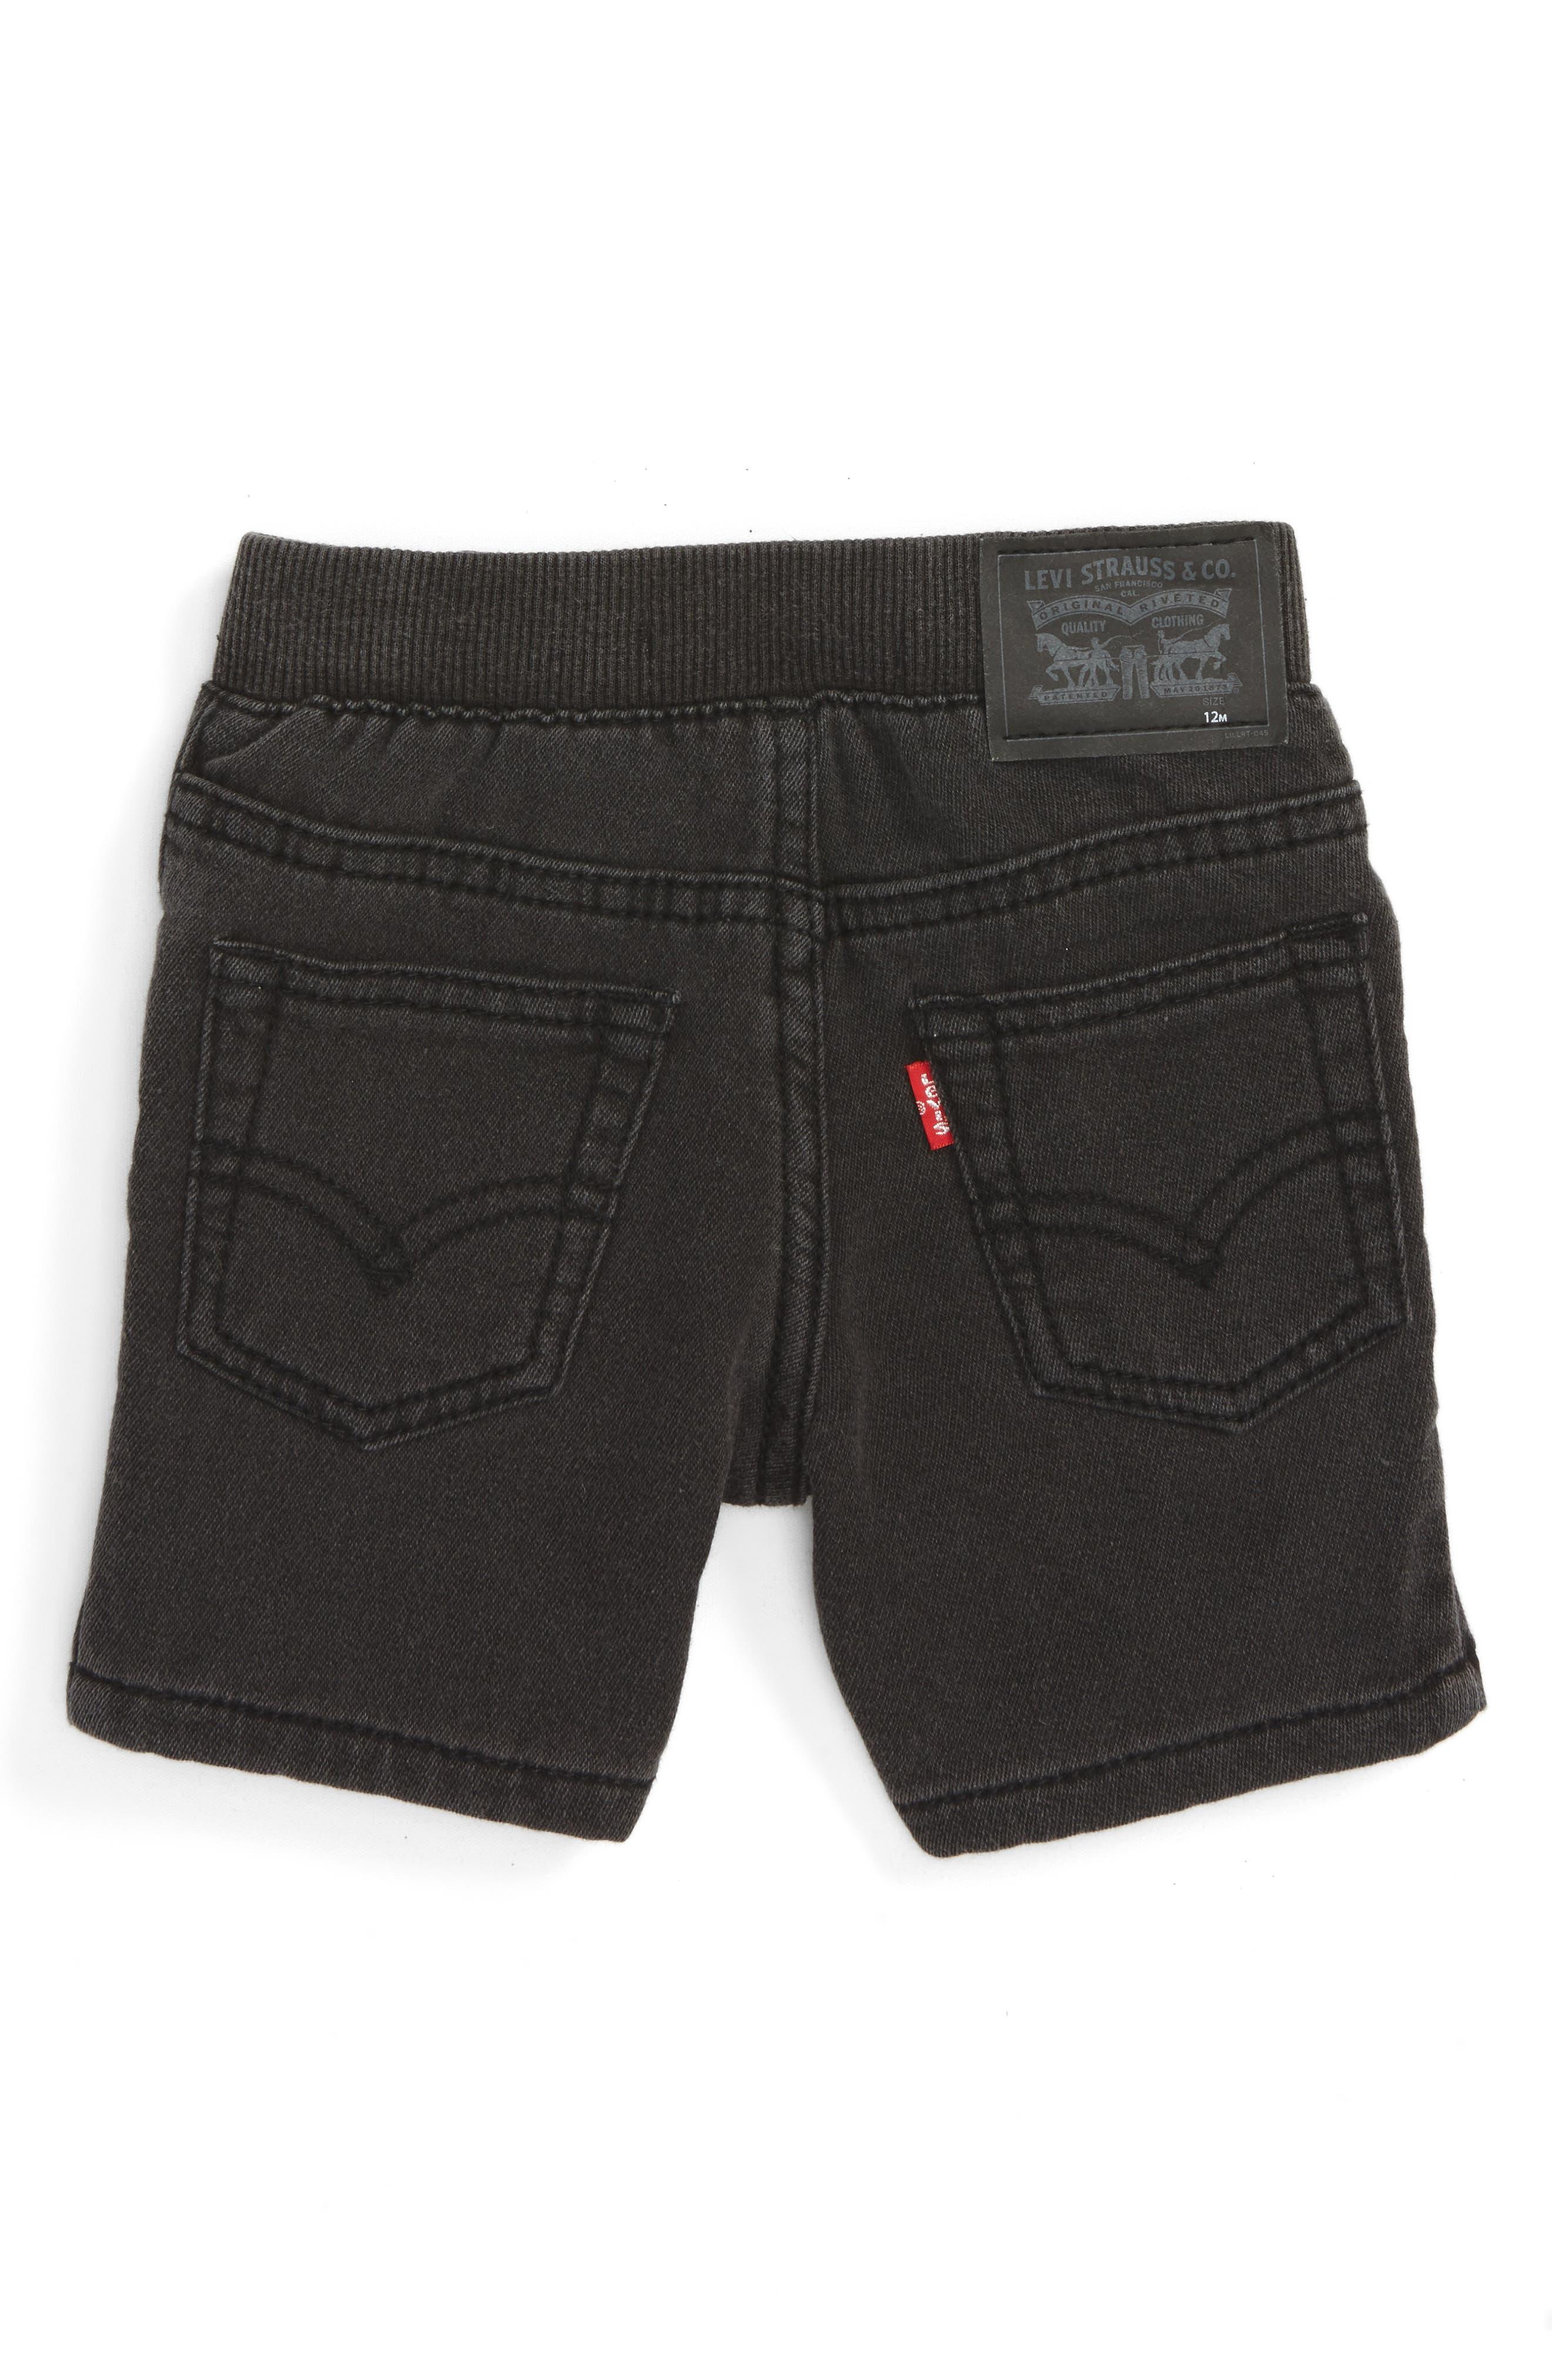 Knit Denim Shorts,                             Main thumbnail 1, color,                             PEBBLE GREY